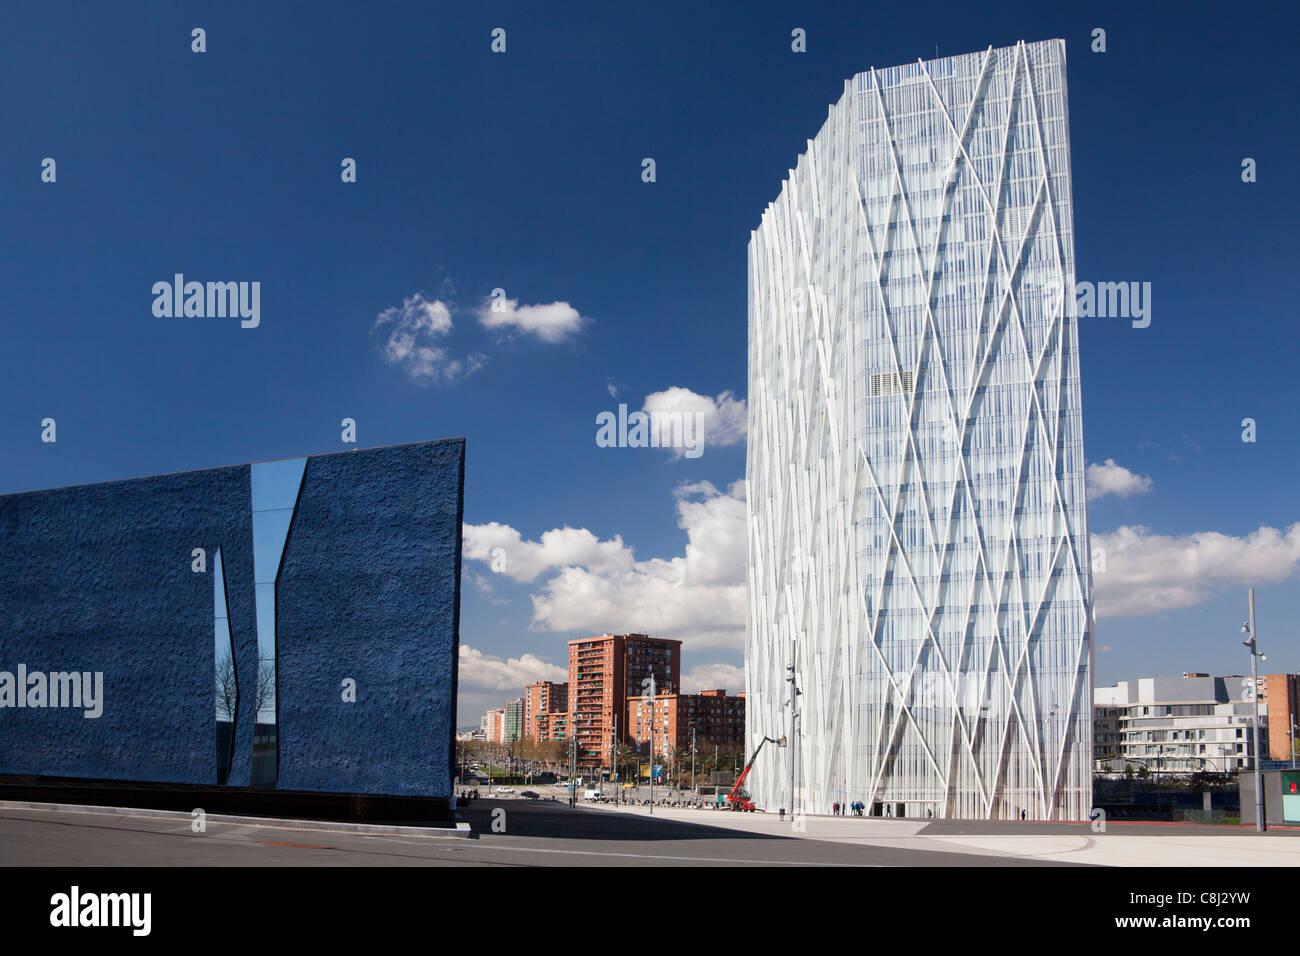 Spain, Europe, Catalunya, Barcelona, Diagonal Mar, buildings, architecture, modern, Forum - Stock Image